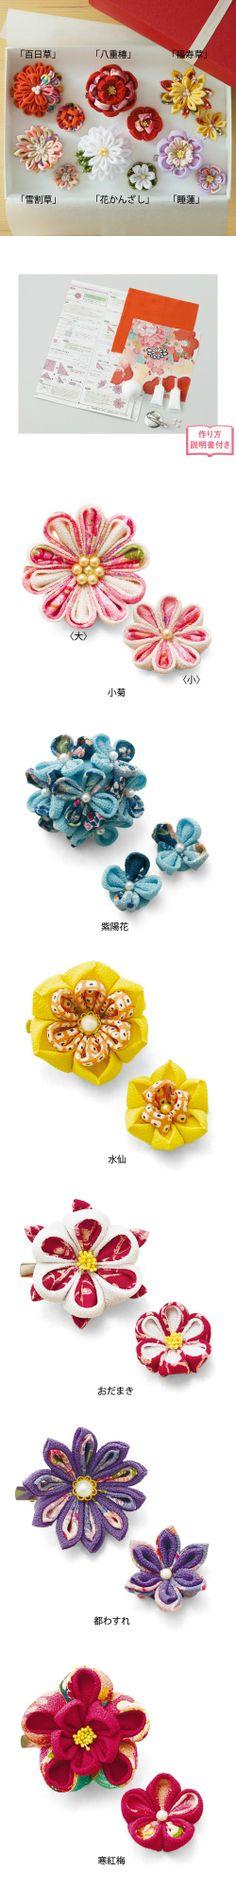 DIY Kanzashi Fabric Flower (Part 1) | ちりめんで形にする和の趣 四季折々つまみ細工のお花の会(12回限定コレクション)zakka collection (JP)